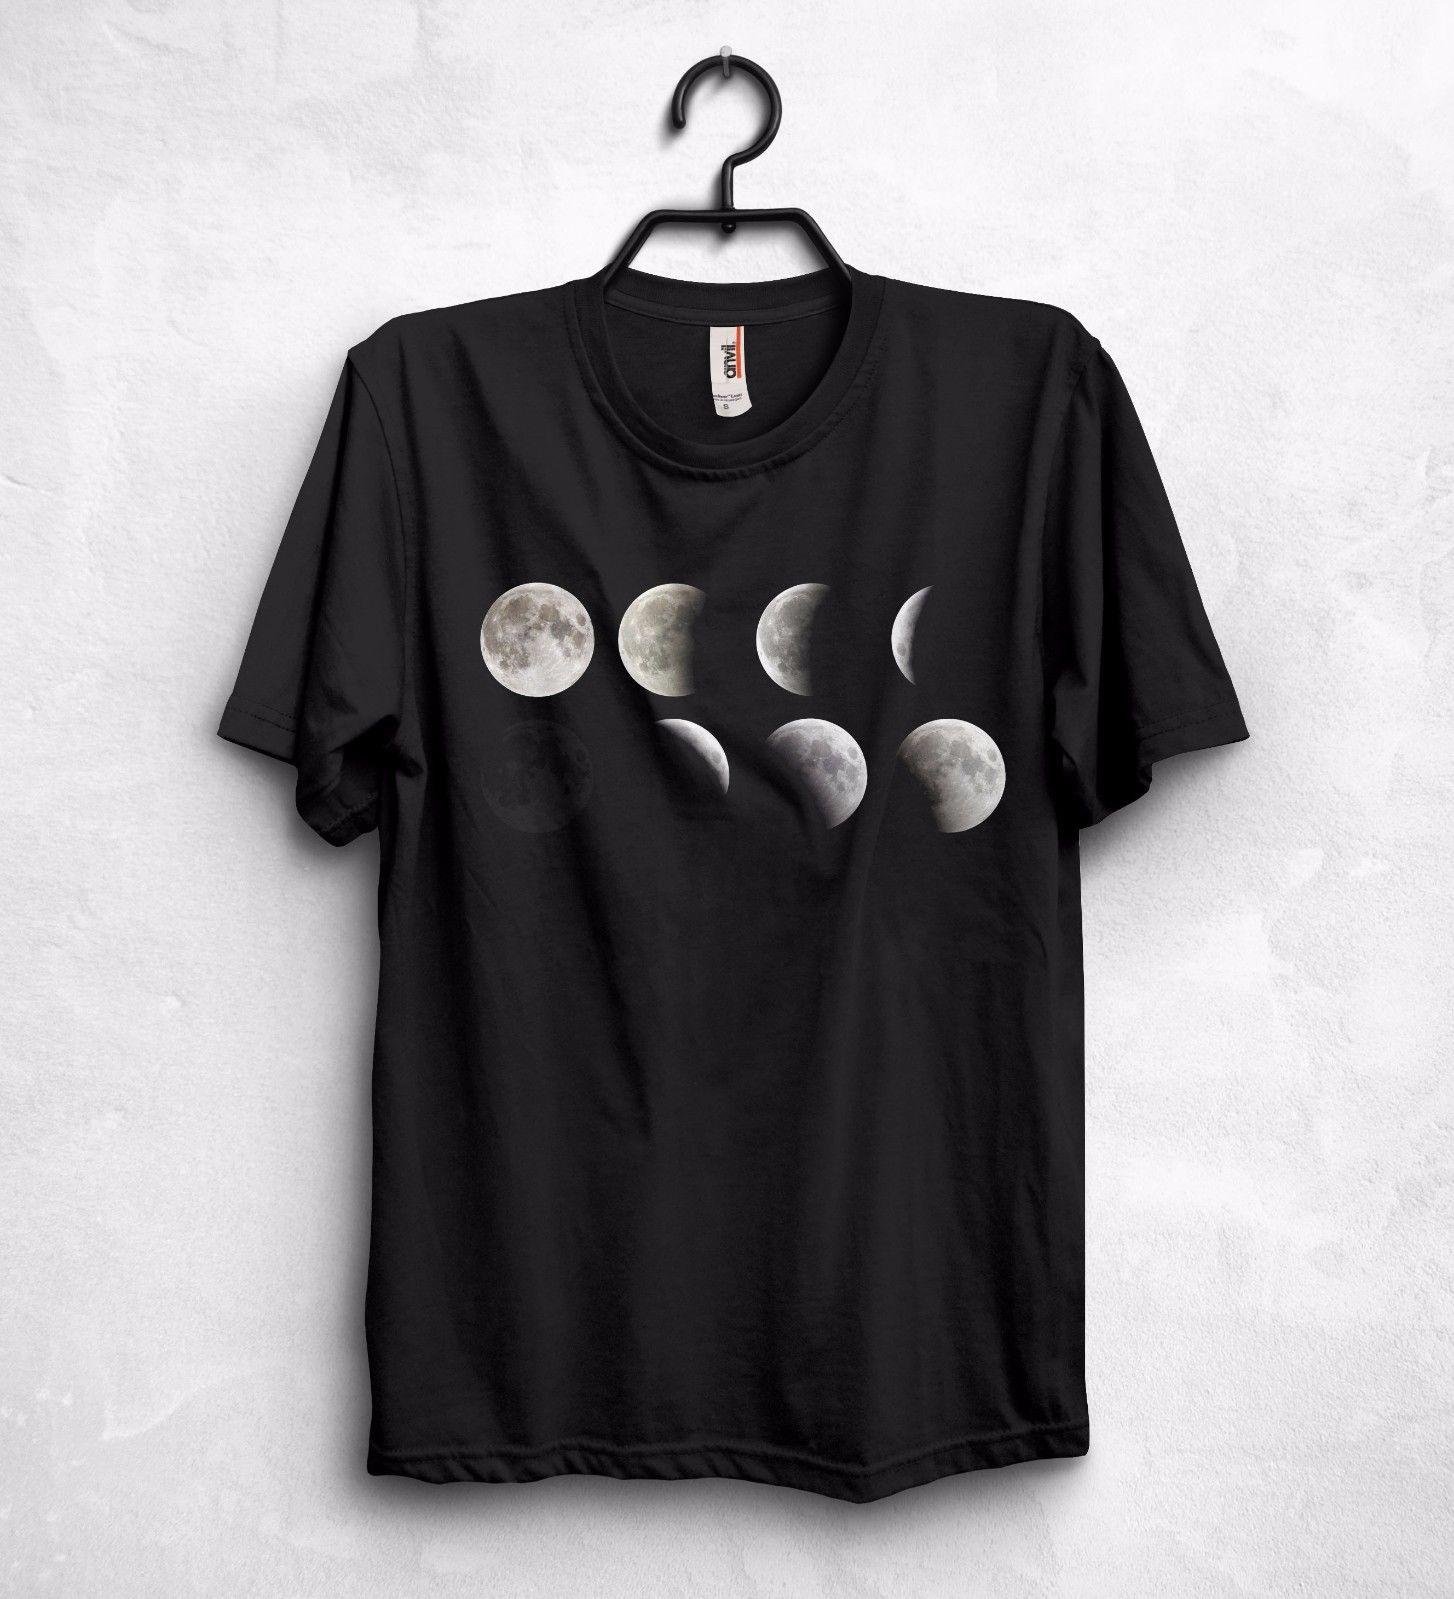 Varie Fasi Lunari Luna T Shirt Top Scienza Geek Nerd Regalo Astronomia Spazio Cotone T-Shirt Moda Spedizione Gratuita